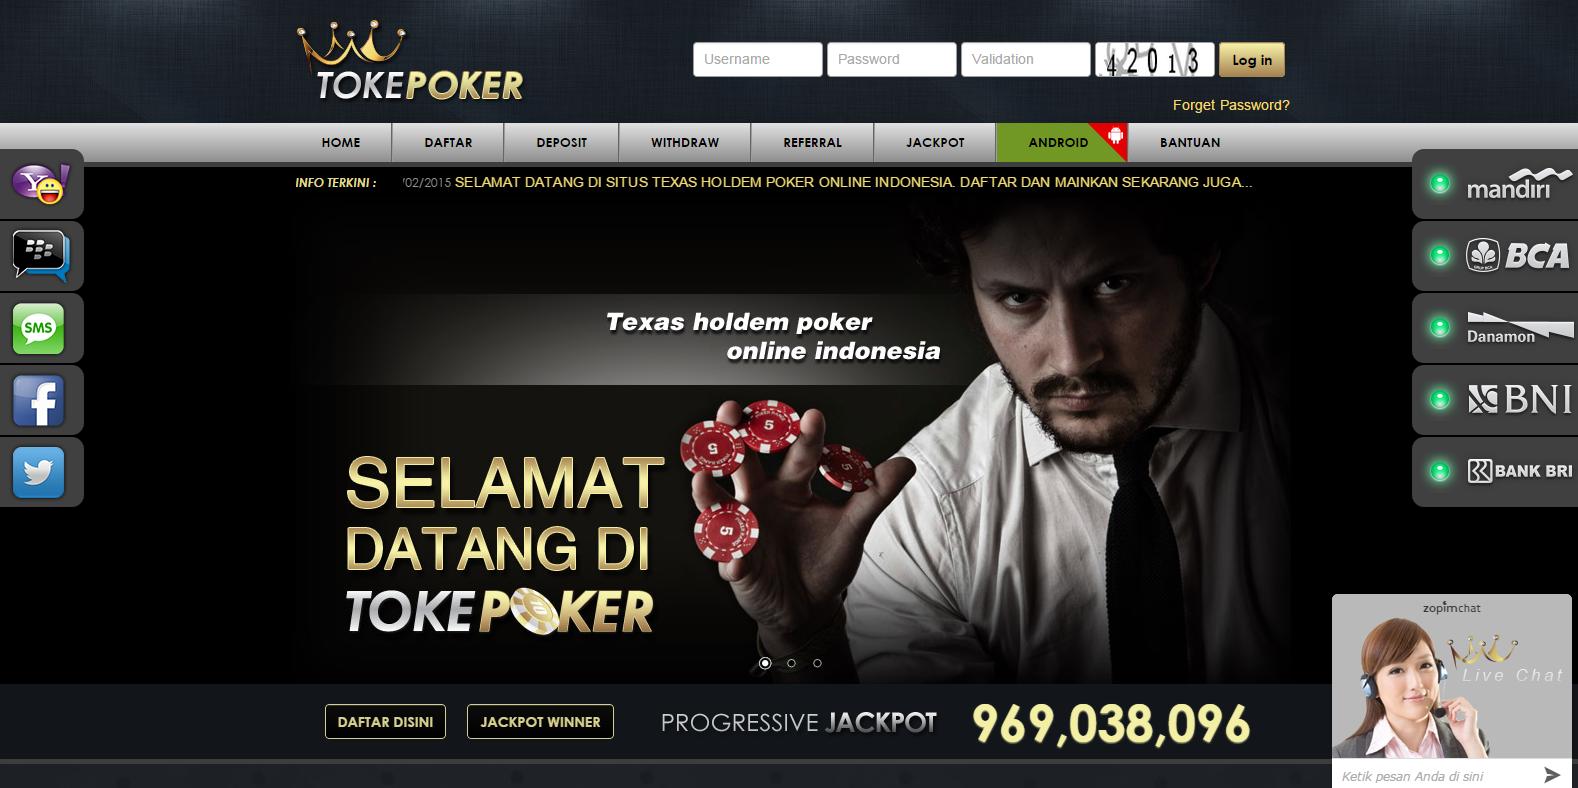 tokepoker.com